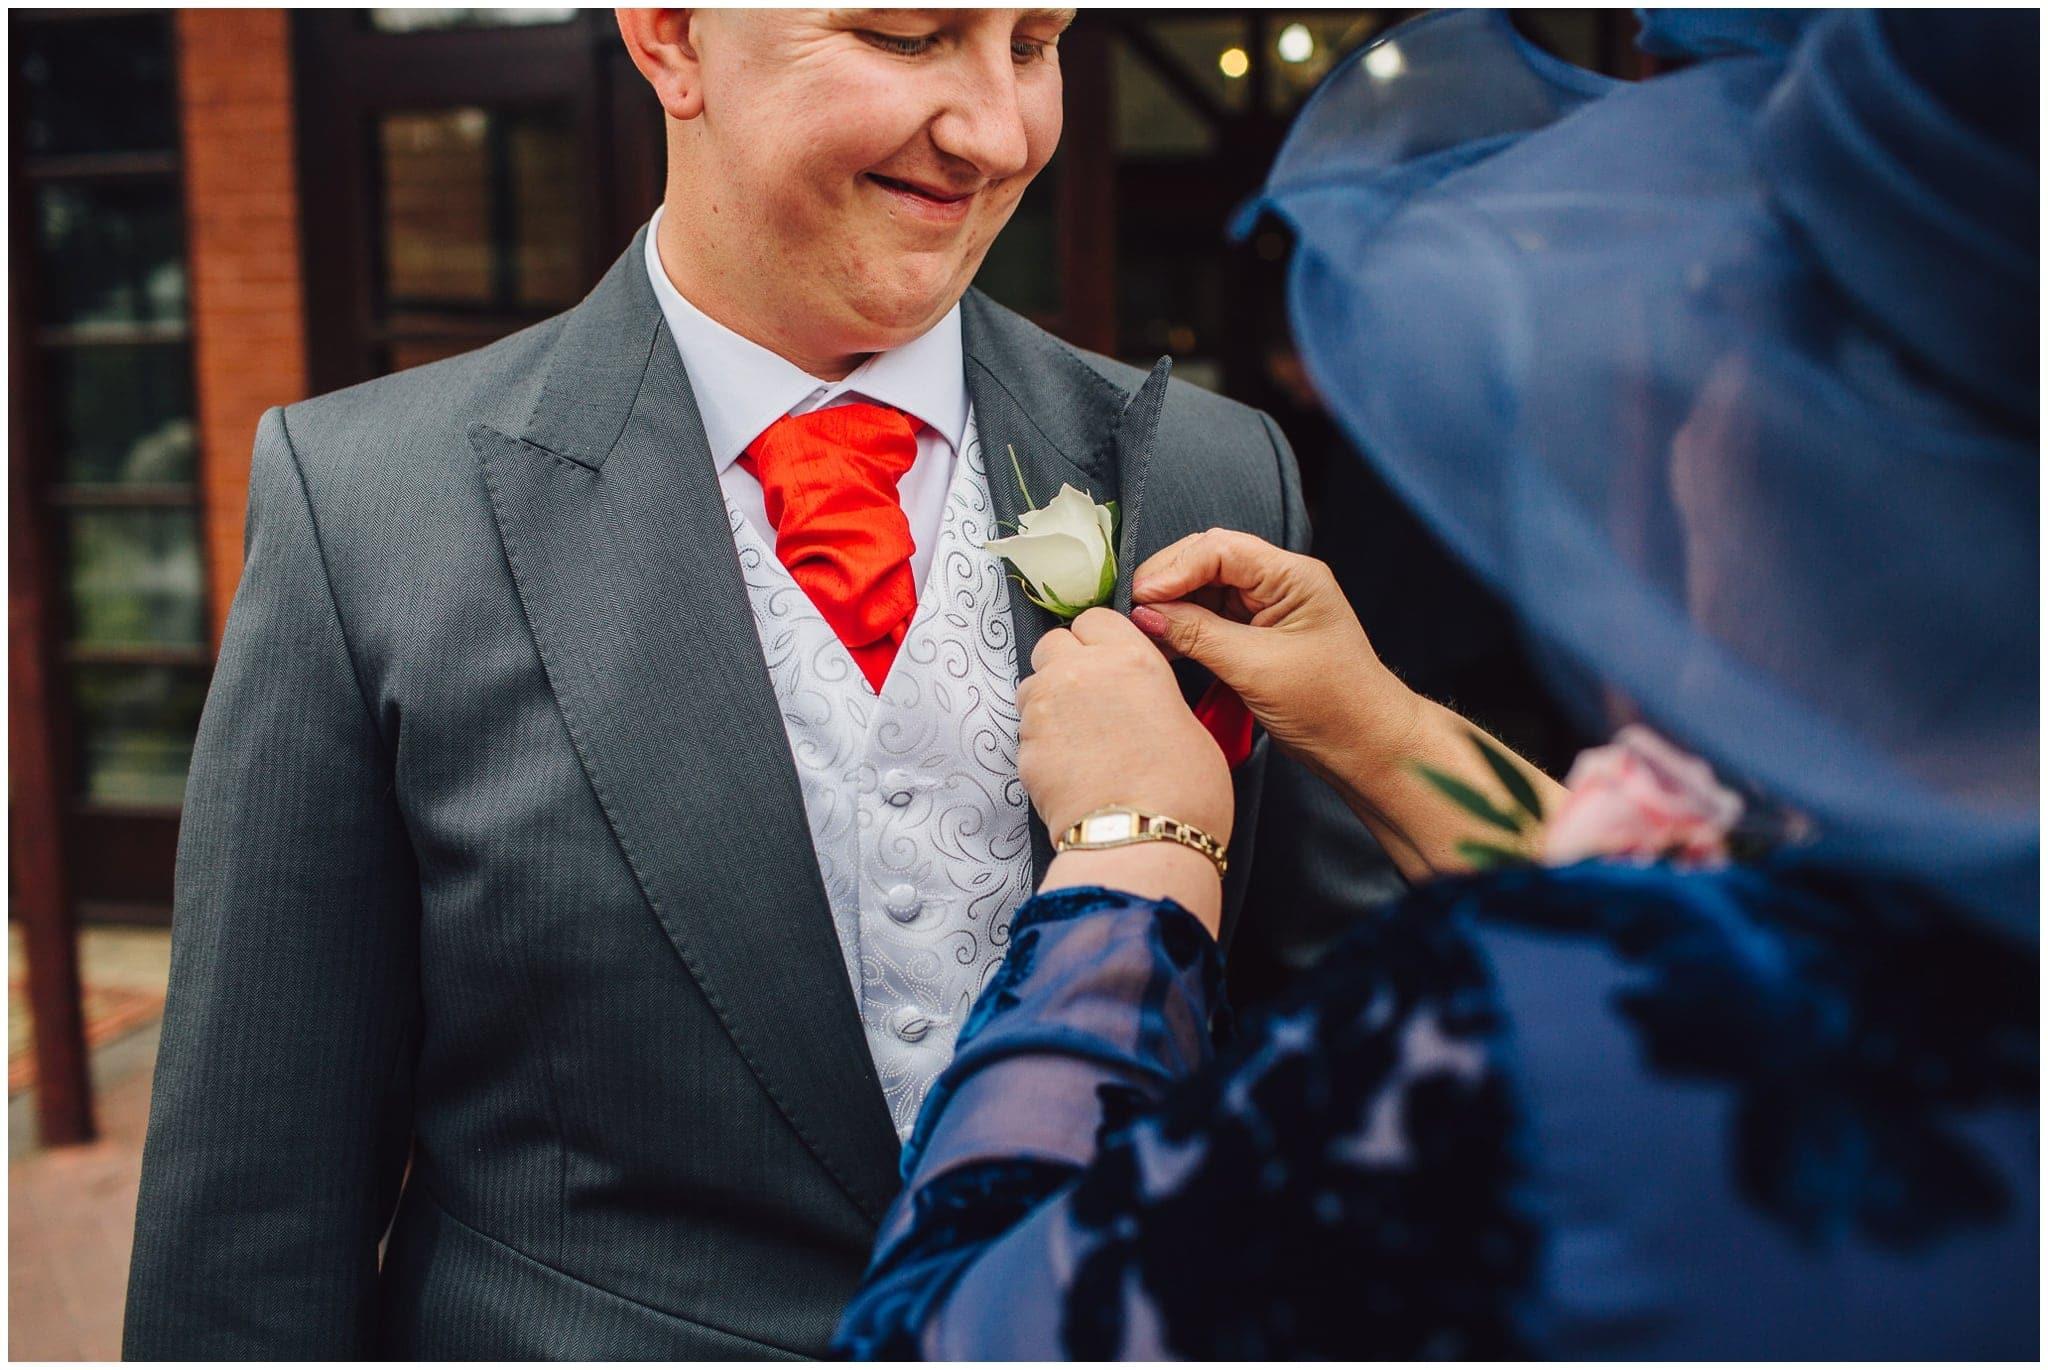 coventry-wedding-photographerx-5